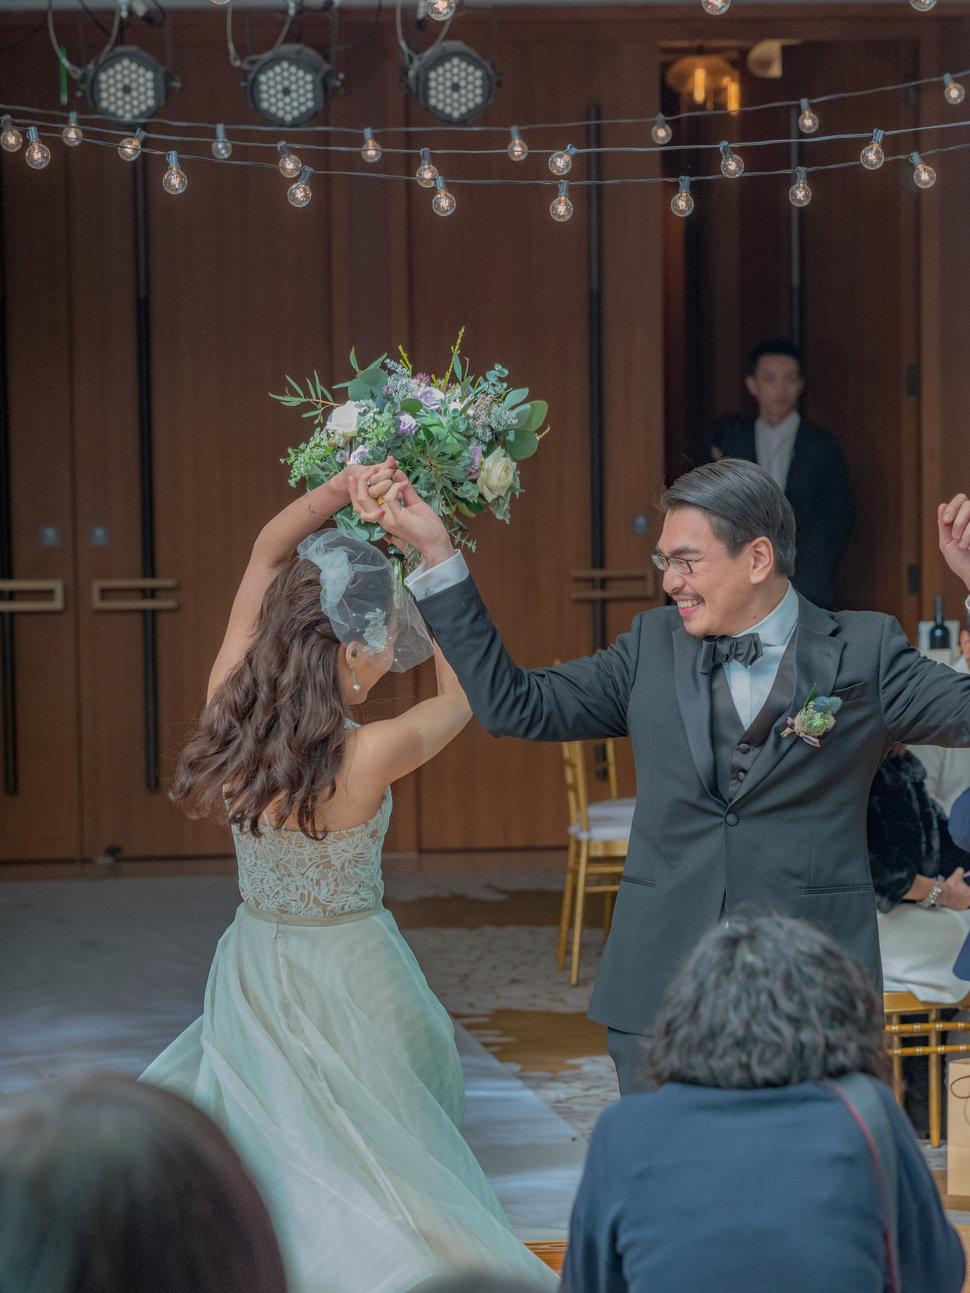 P1450161 - 攝藝錄影像團隊 - 結婚吧